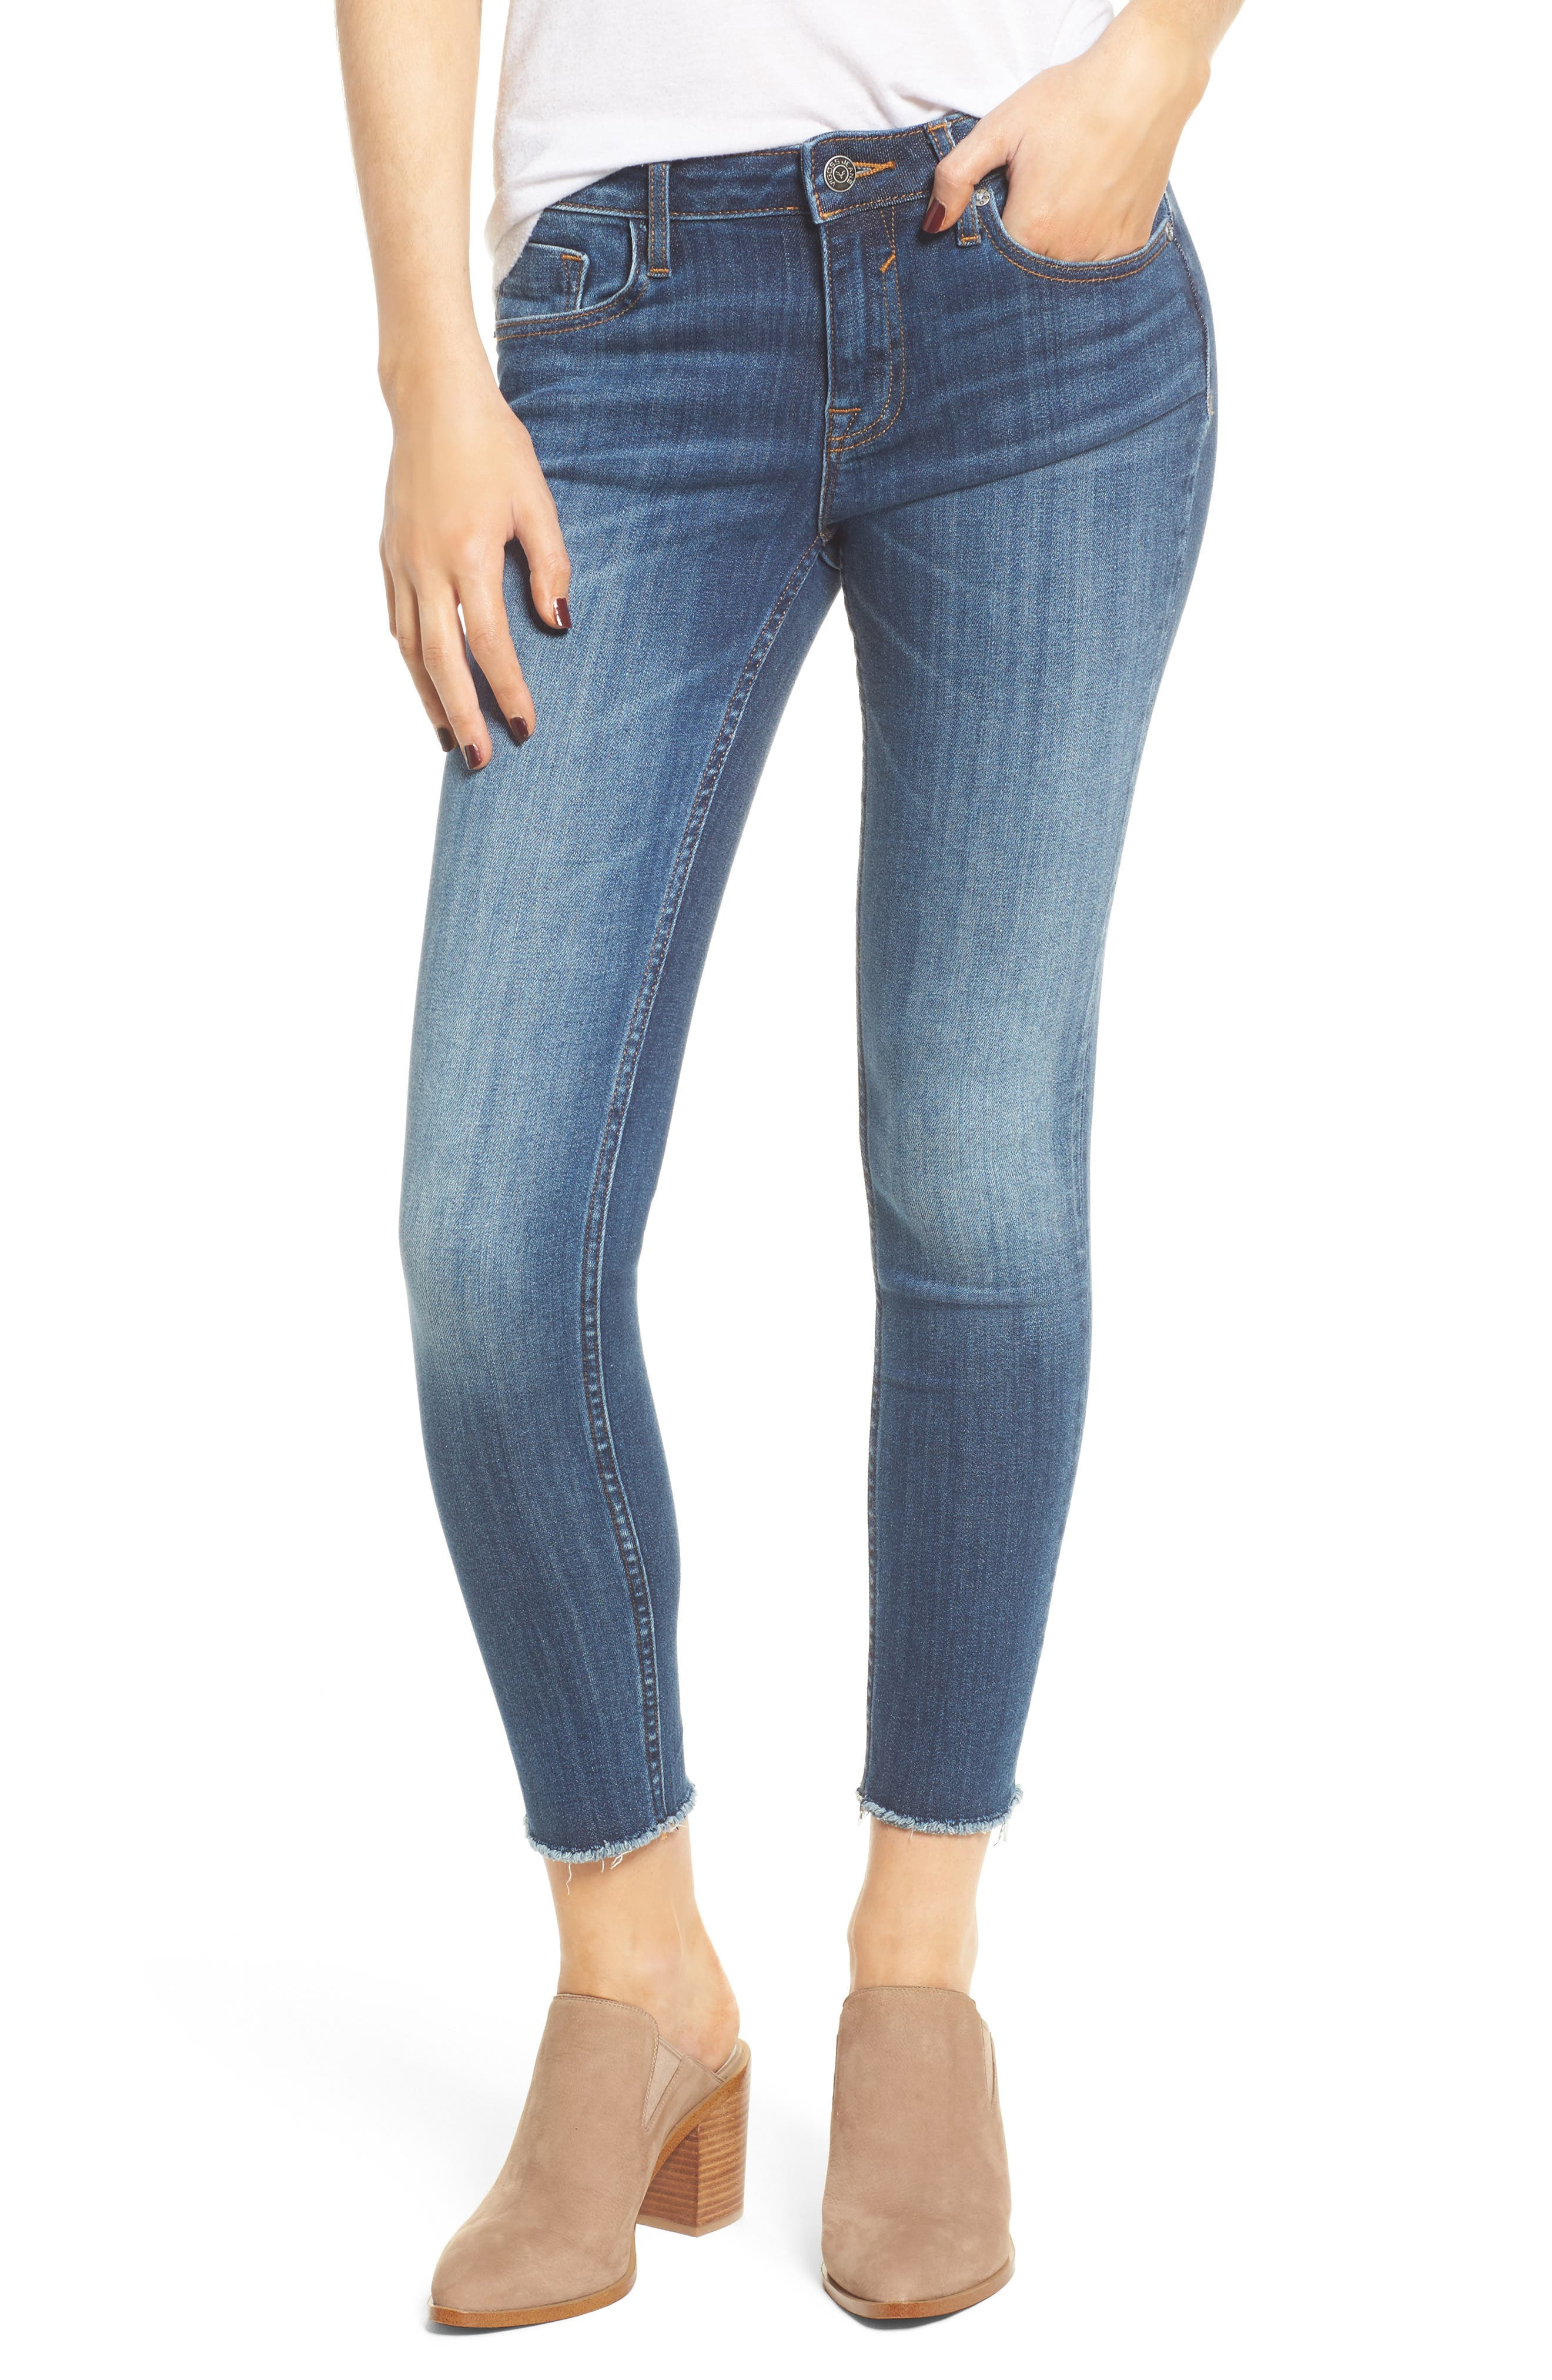 Jagger Mid-Rise Skinny Jeans,                             Main thumbnail 1, color,                             403